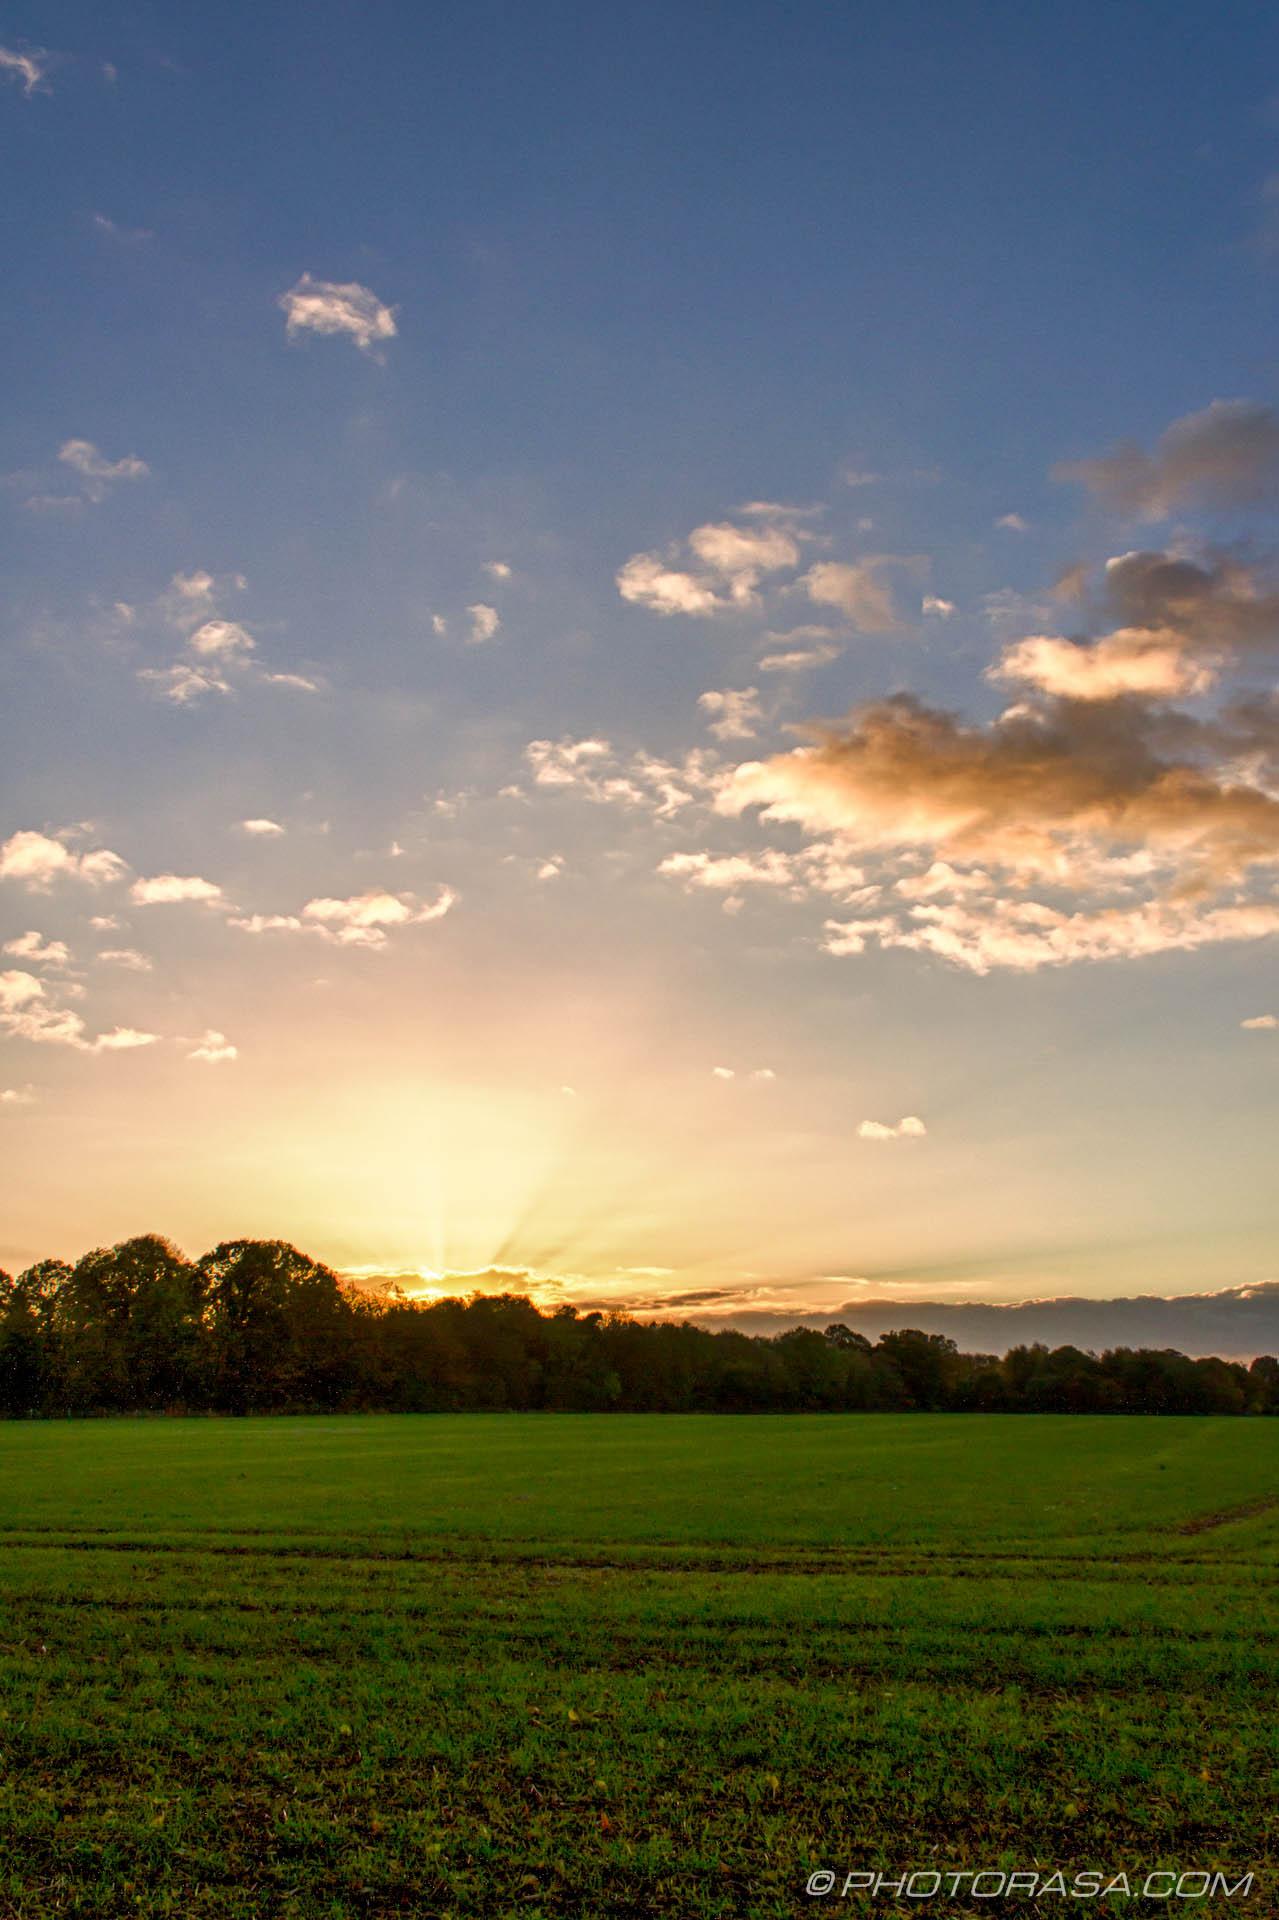 http://photorasa.com/november-evening-sky-farmers-fields/green-fields-light-sky-and-clouds-at-sunset/